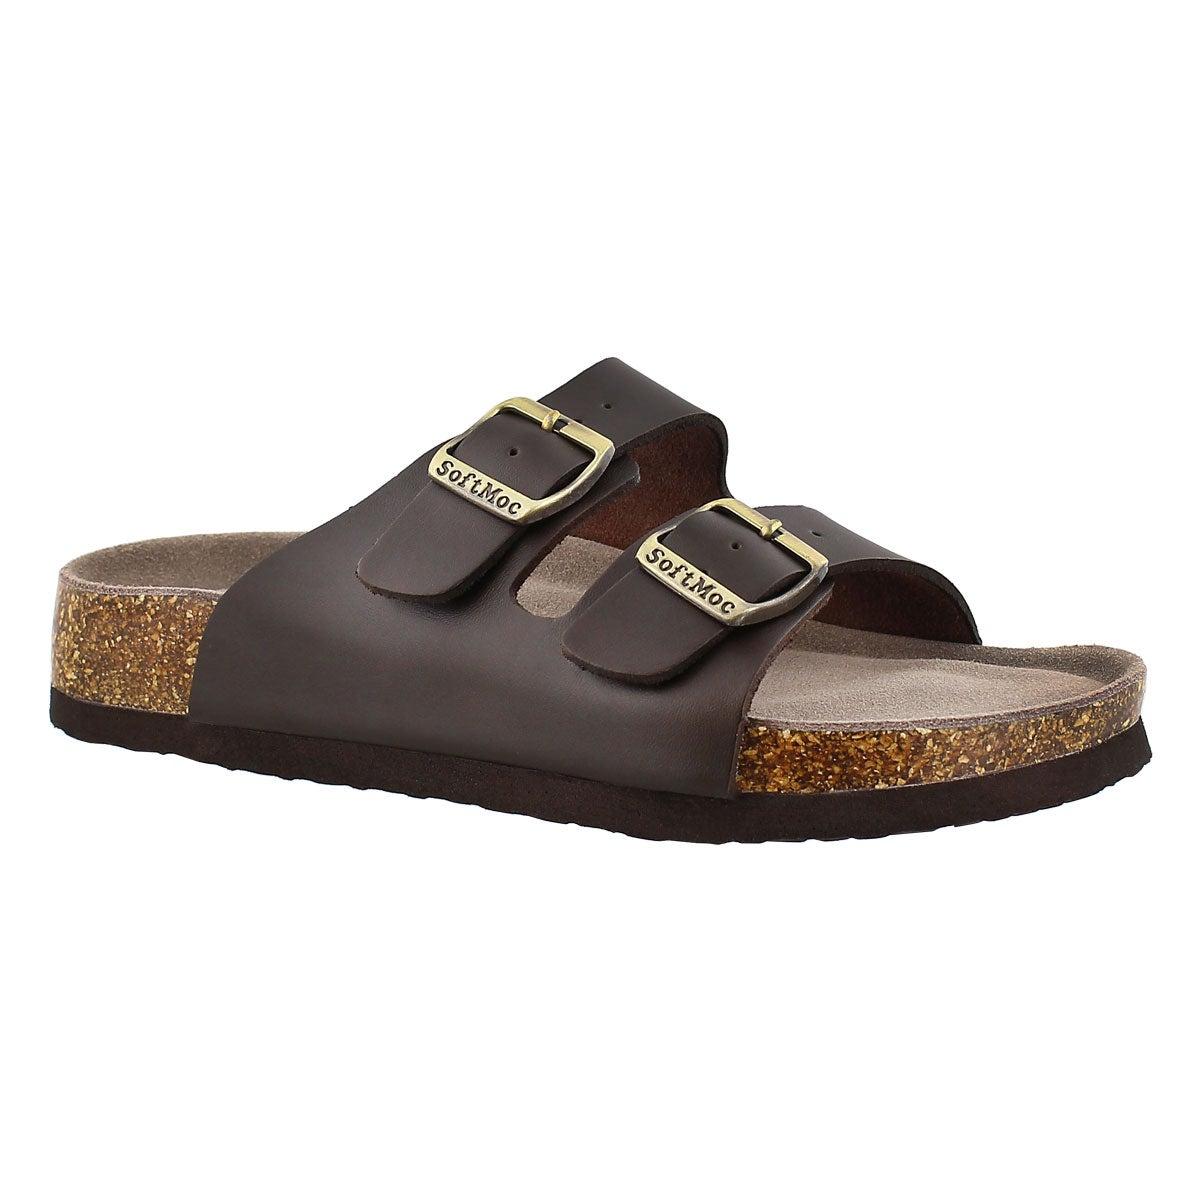 Lds Anna 3 brn memory footbed sandal